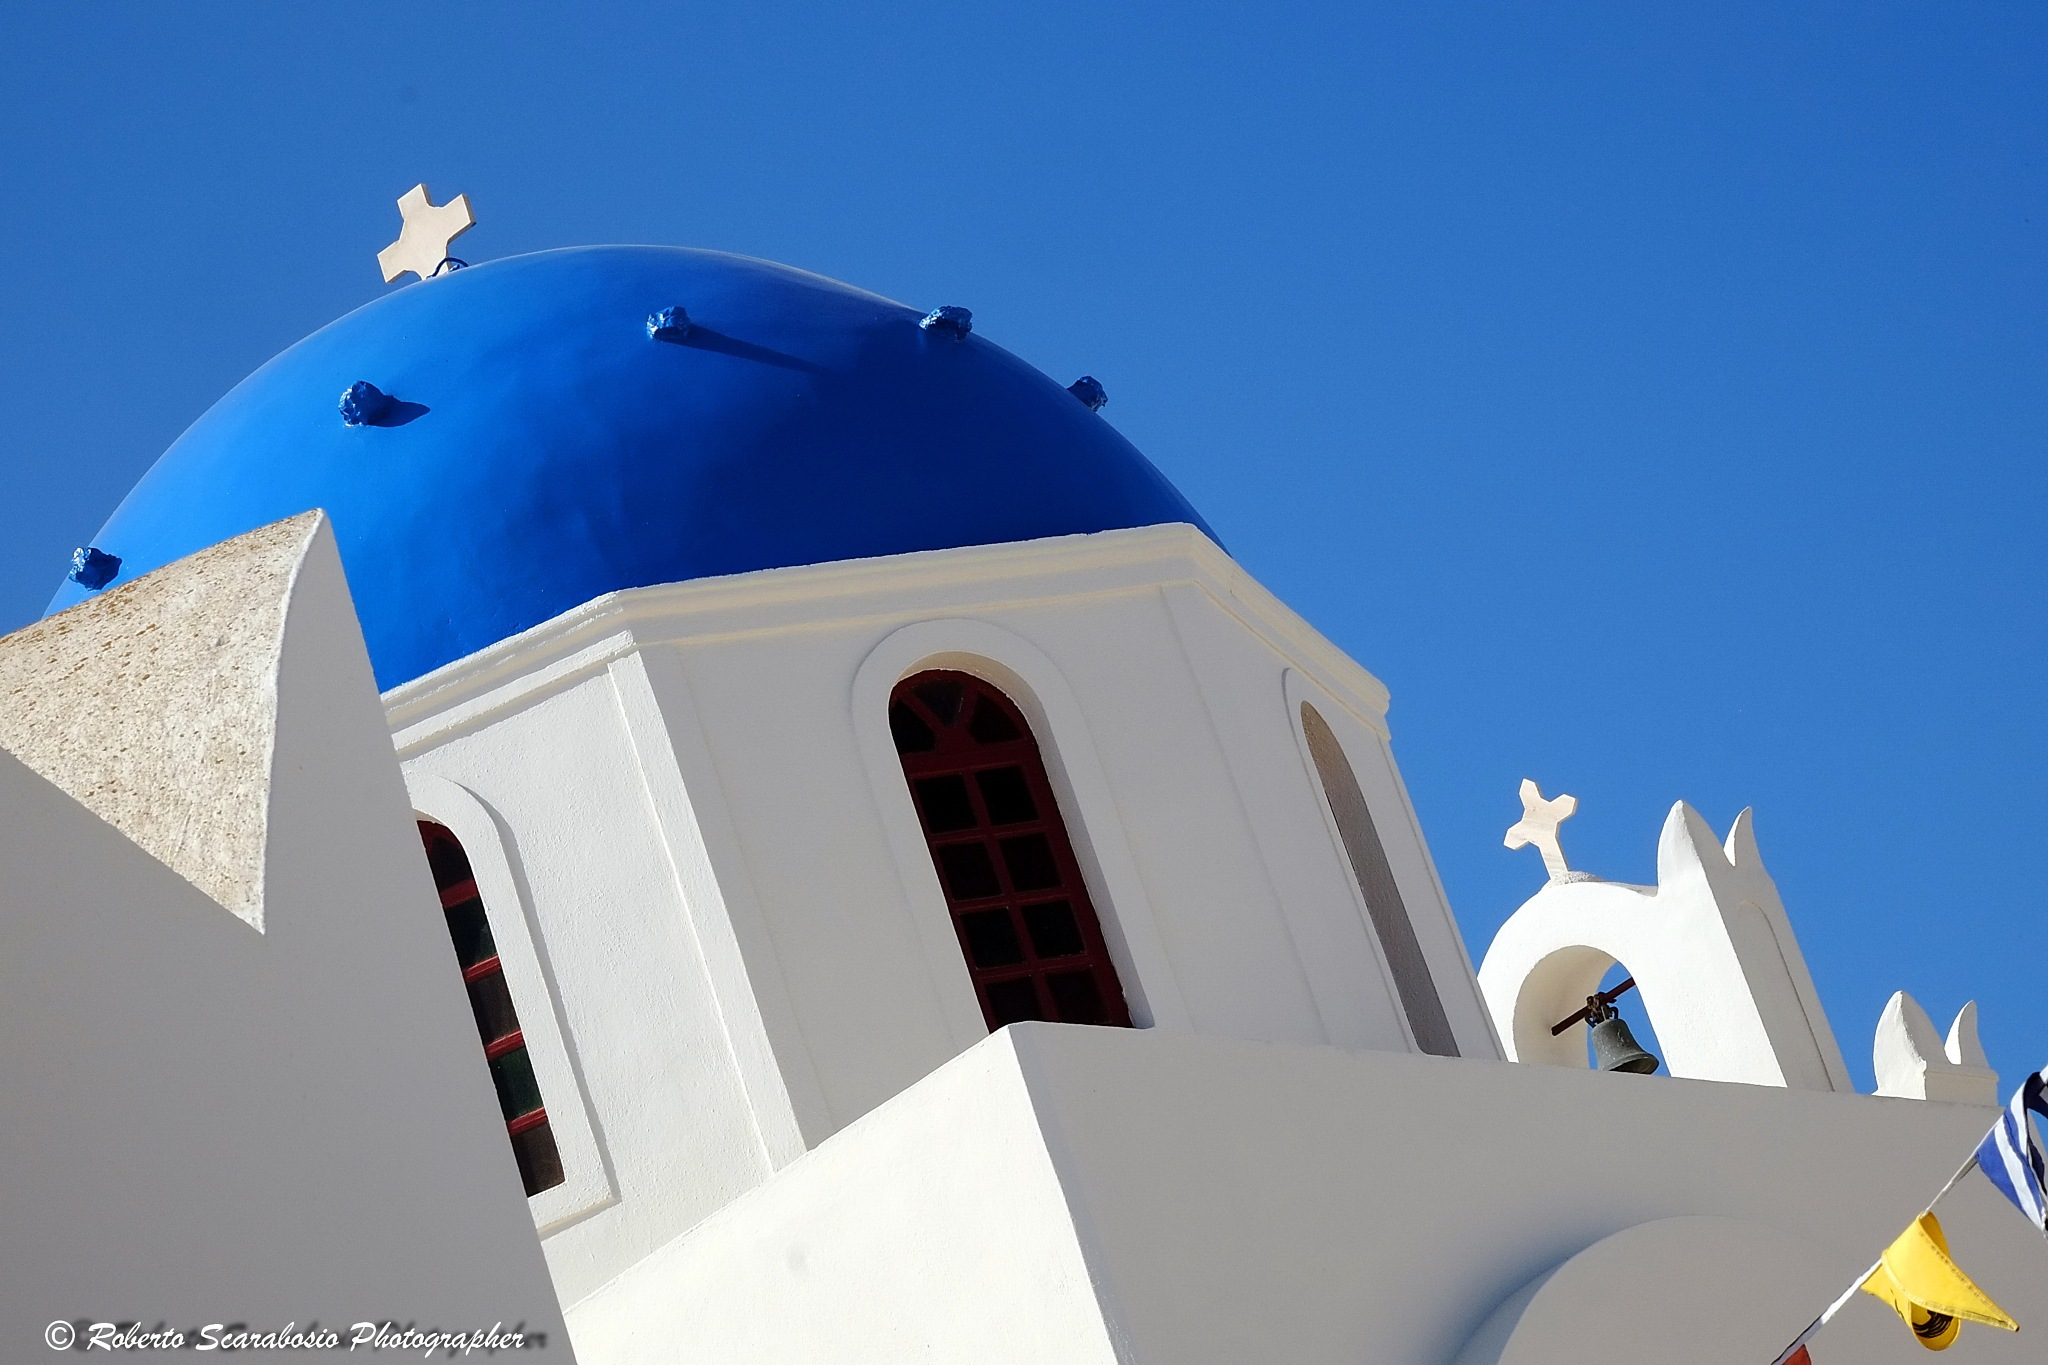 Chiesa by roberto.scarabosio